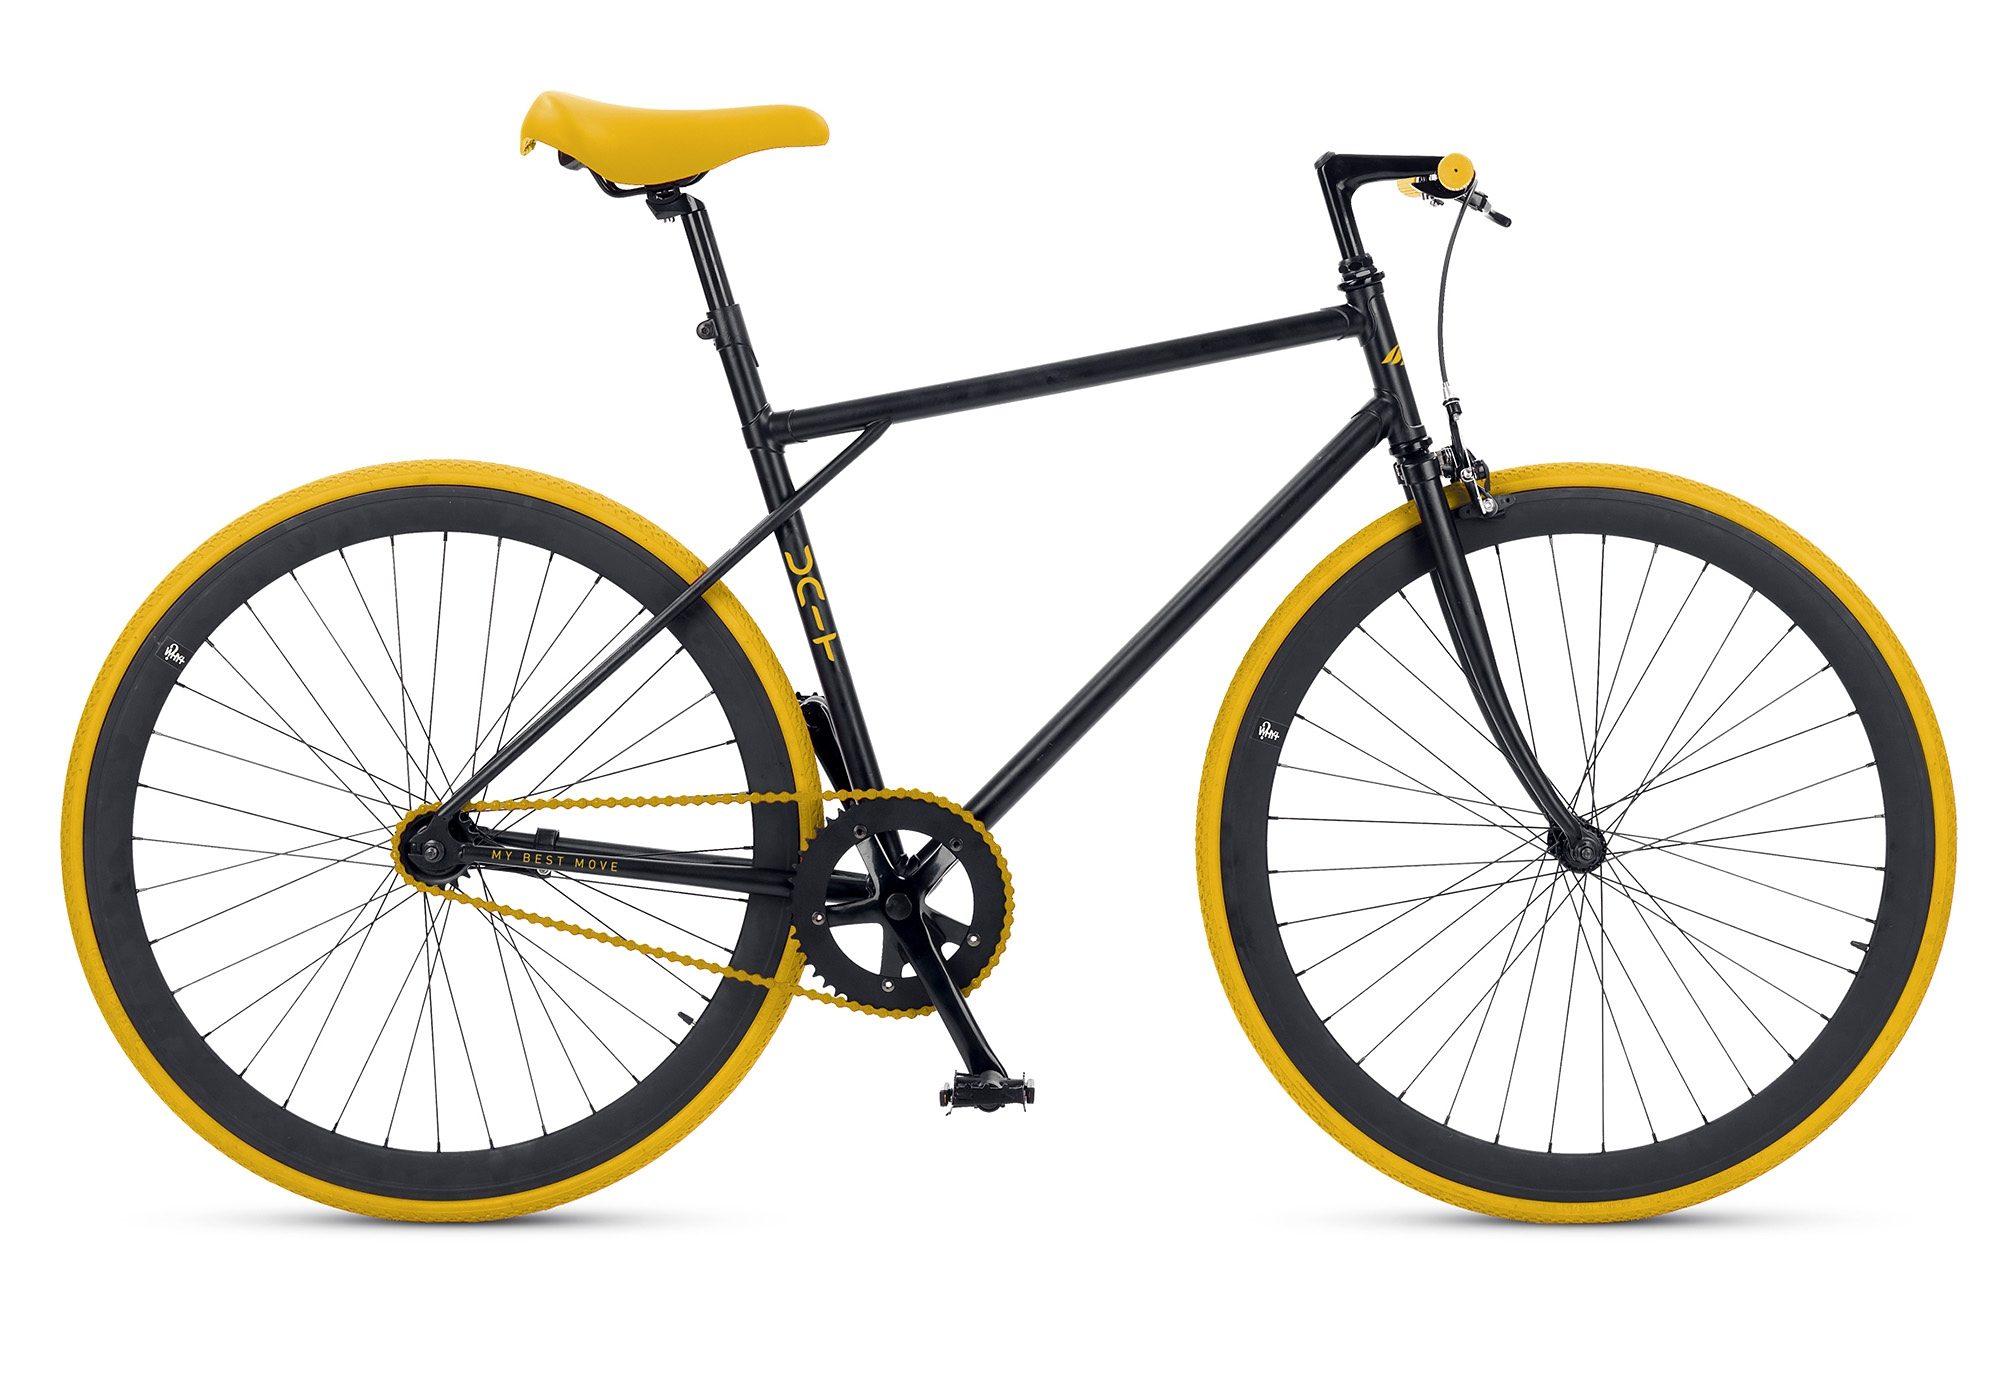 Fitnessbike, 28 Zoll, 1 Gang, Freilauf oder Fixed Gear, »Unit 581 Coaster Brake 1 S«, MBM